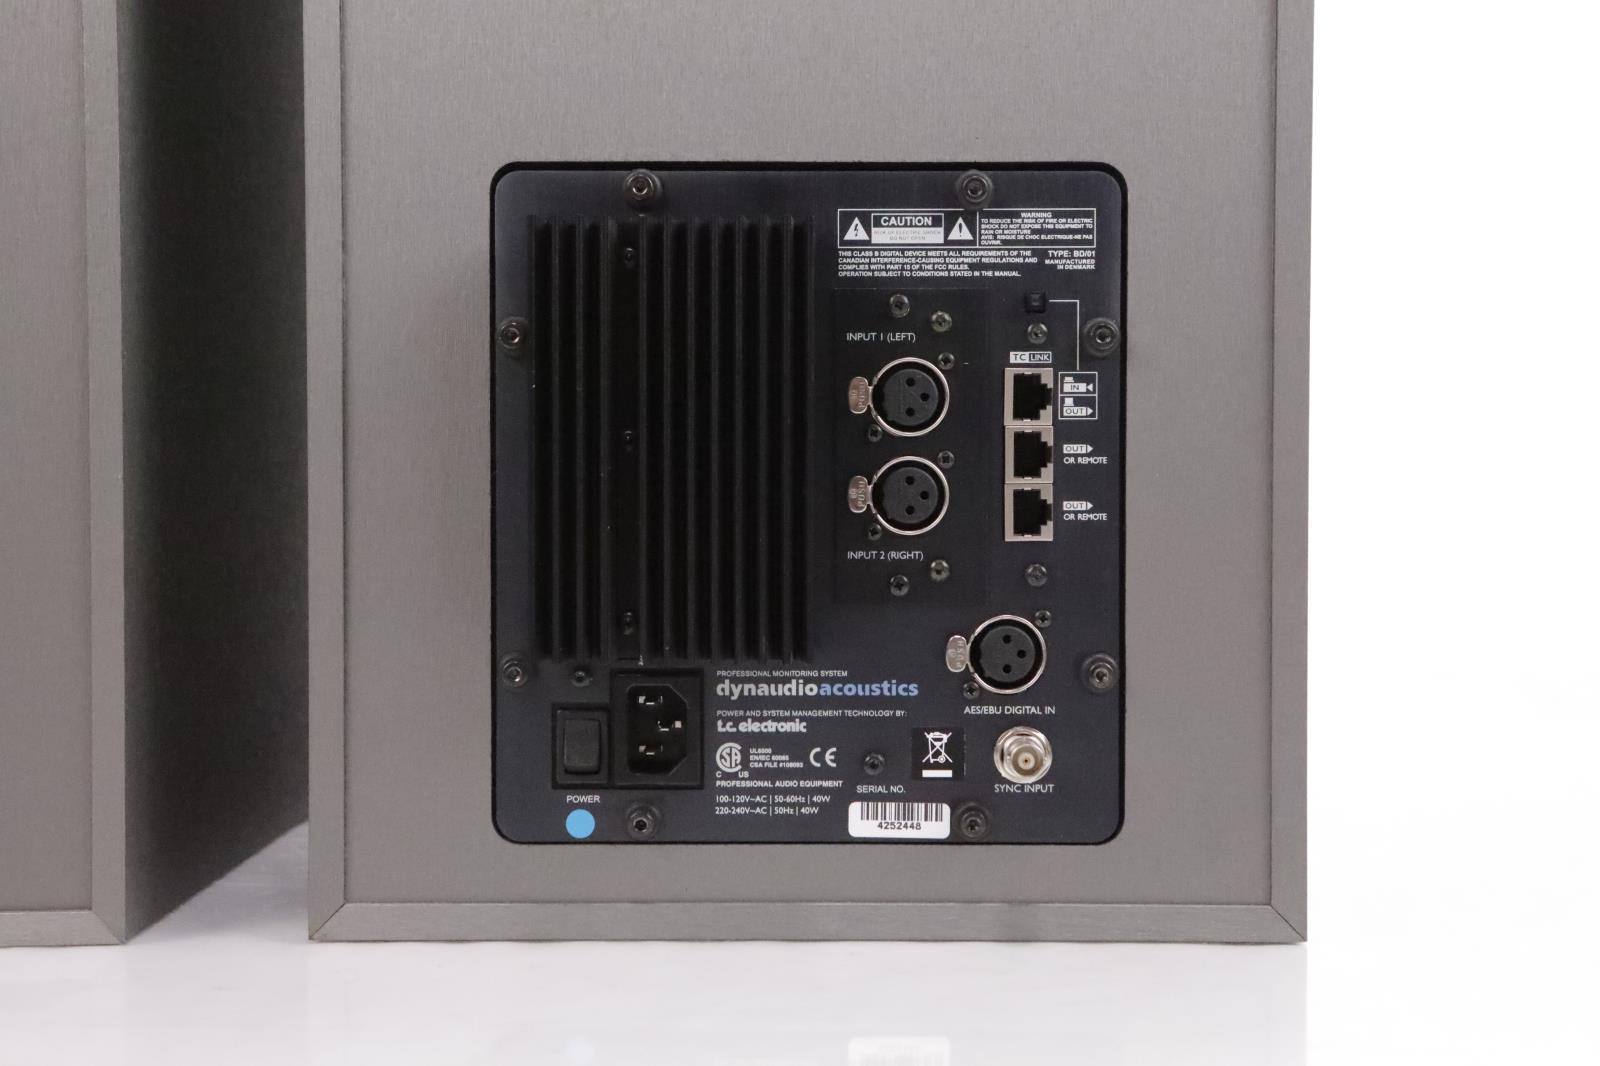 dynaudio air 15 master slave studio monitor speakers 34173 ebay. Black Bedroom Furniture Sets. Home Design Ideas